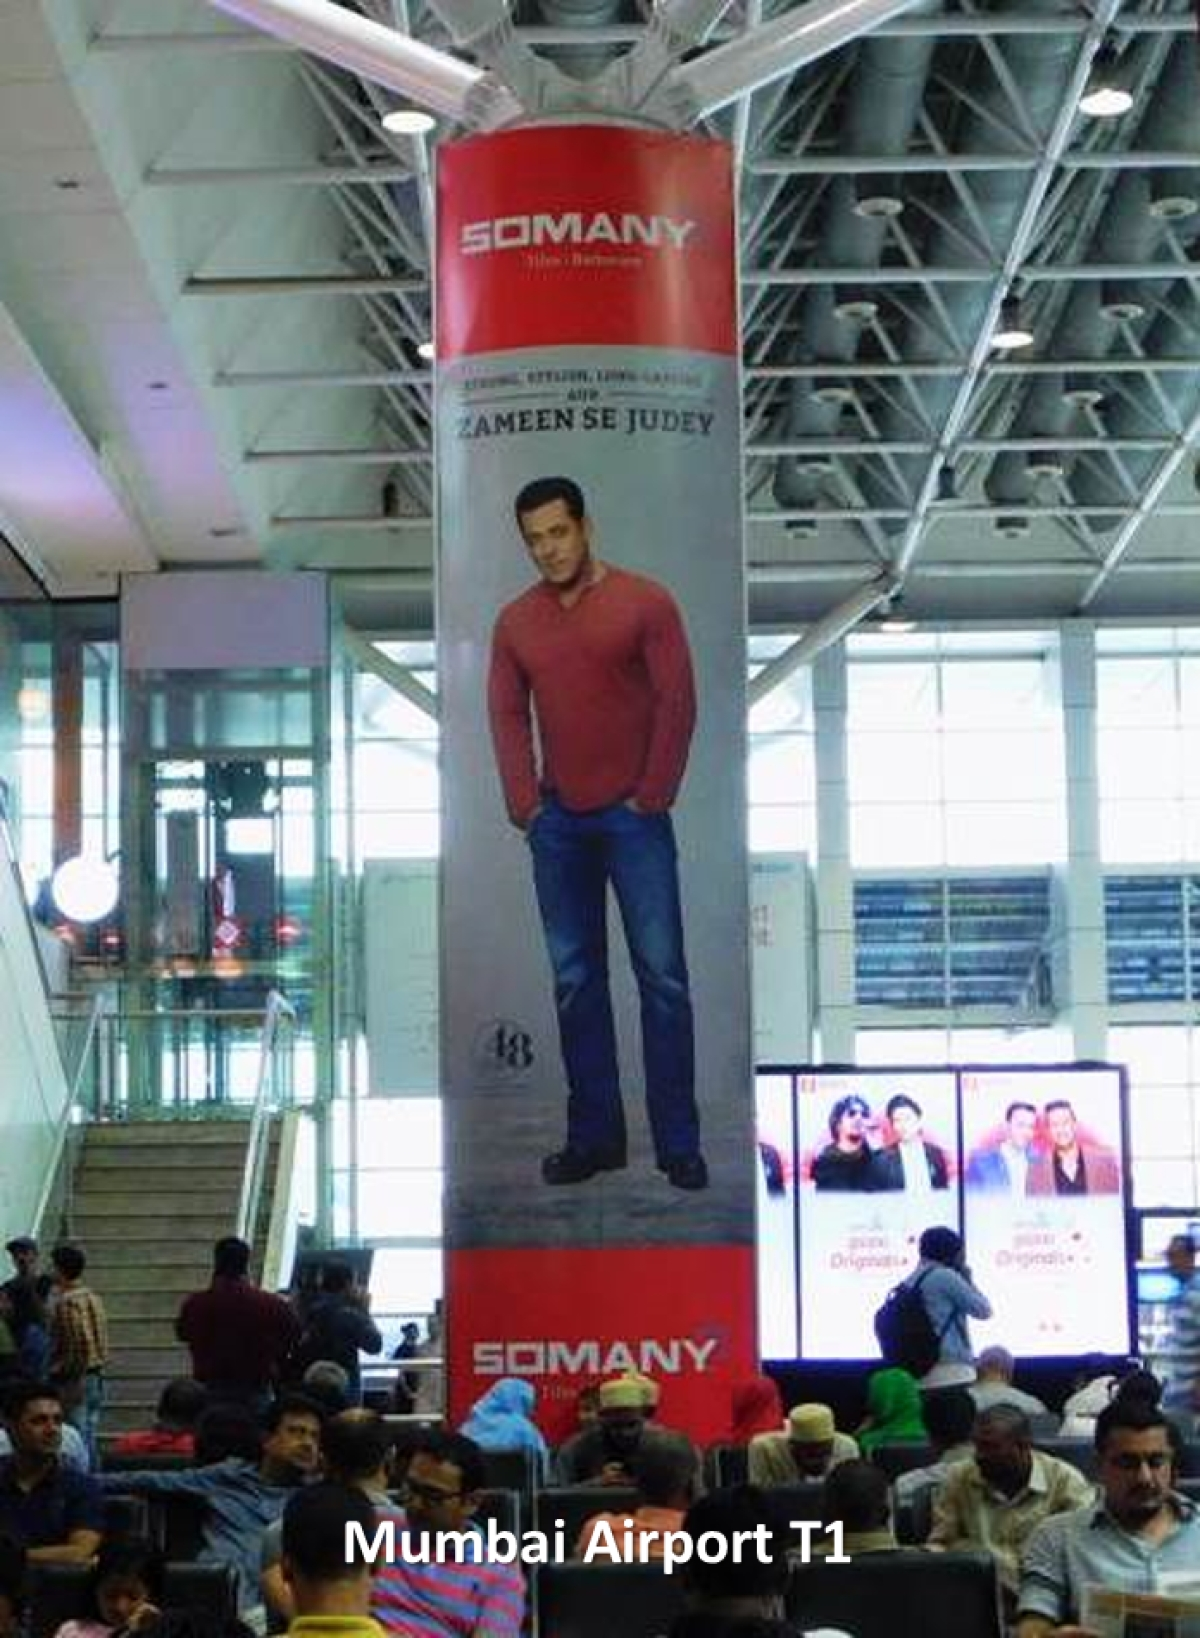 Mumbai Airport T1